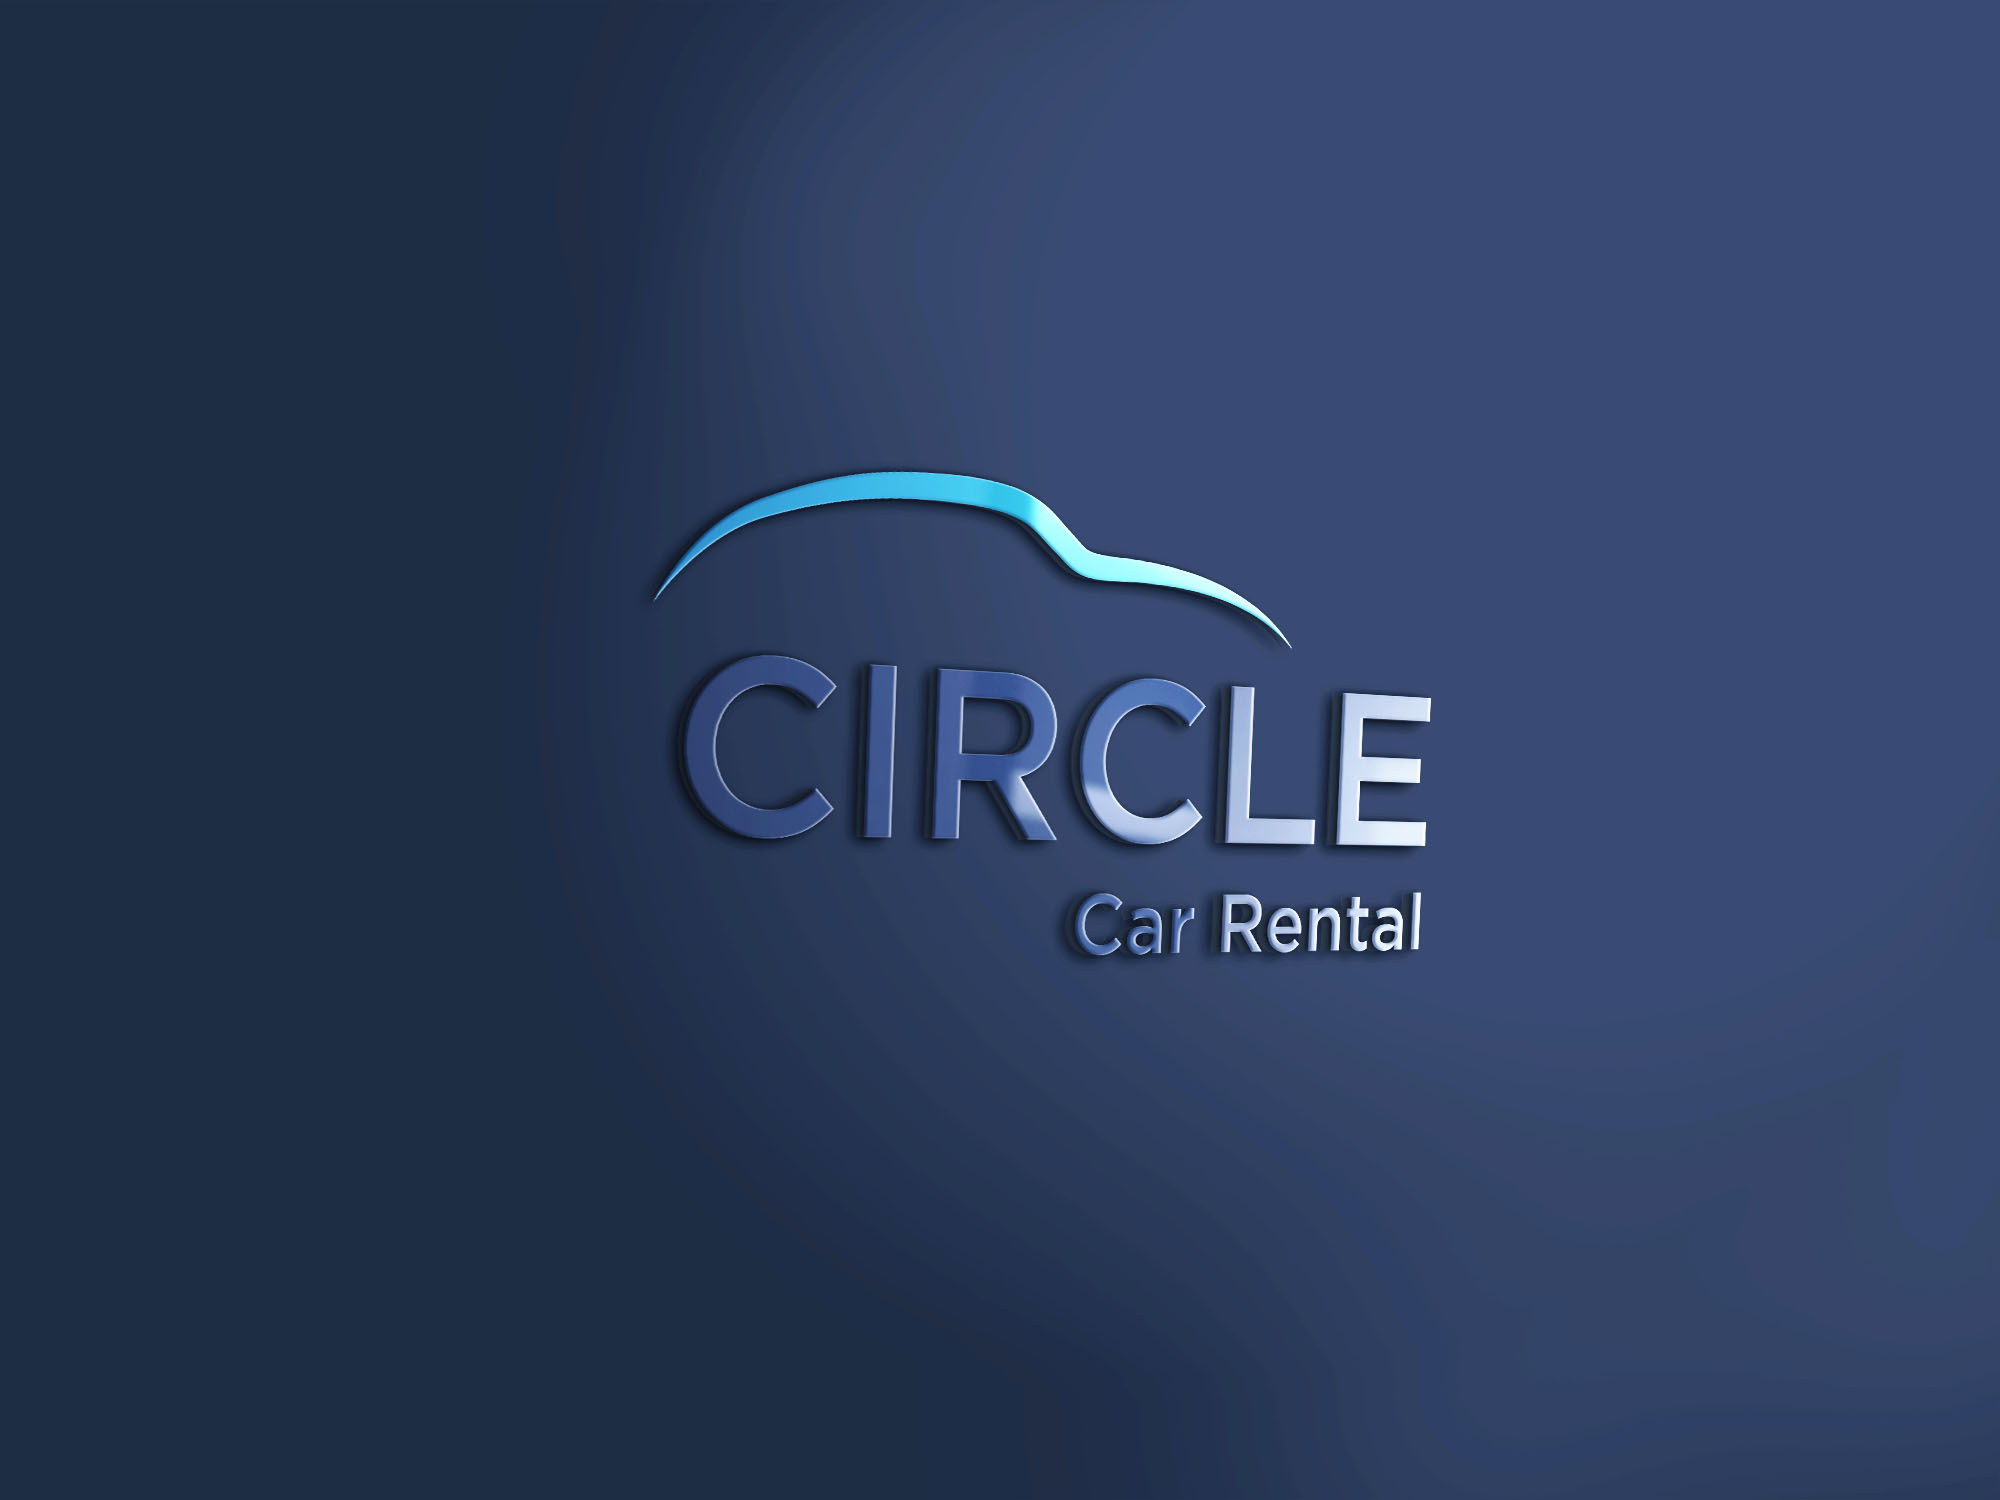 Circle Car Rental 3d Mockup3 1